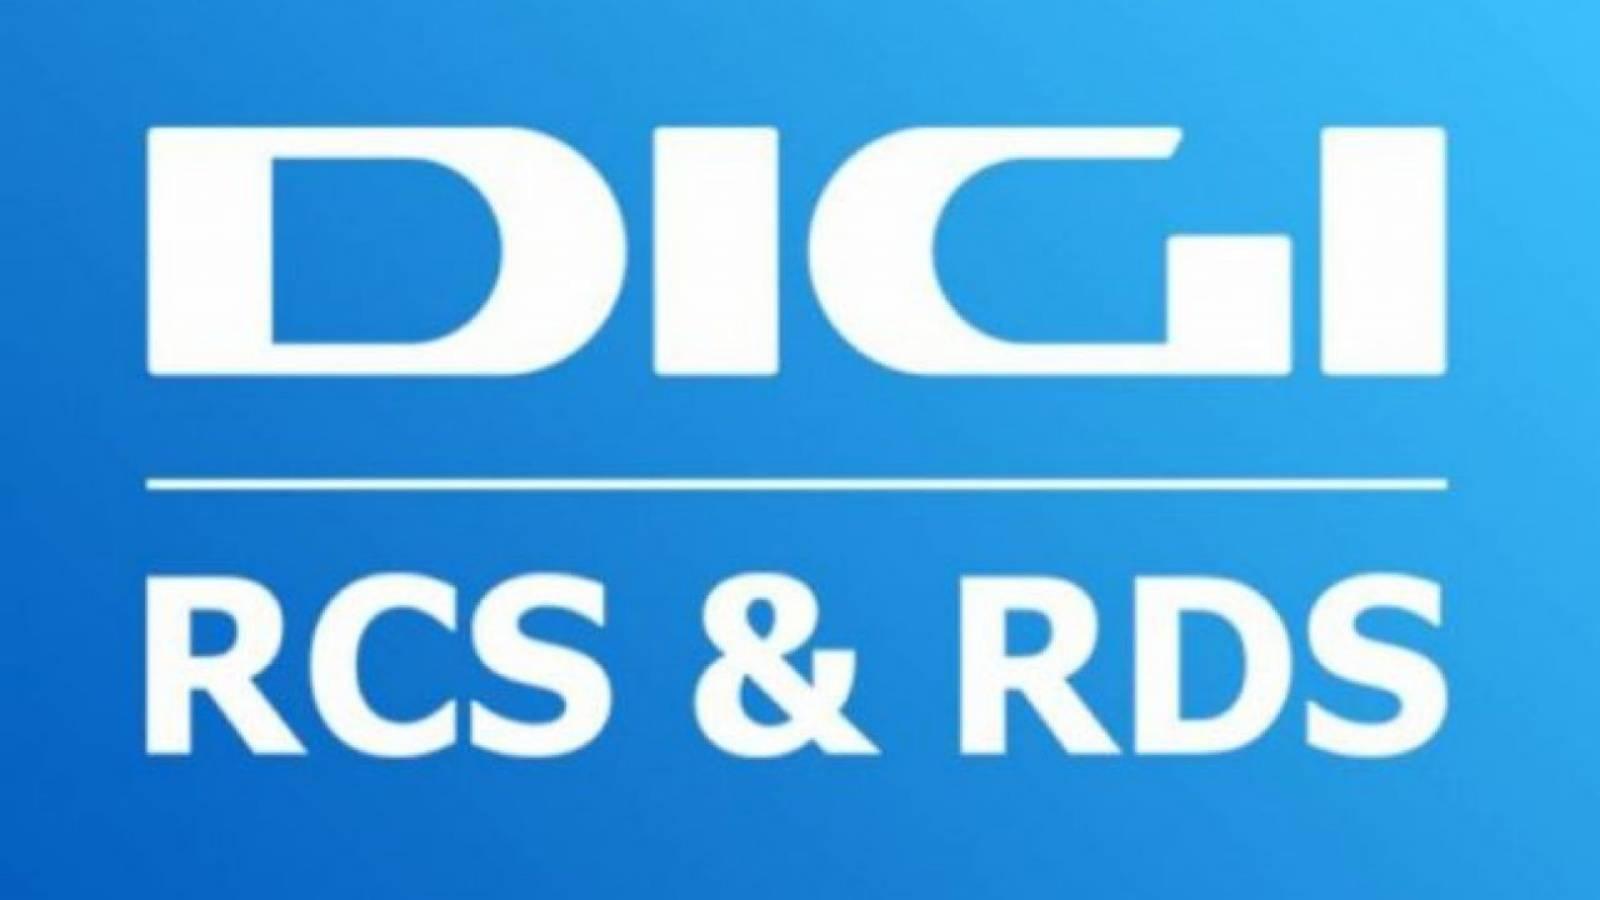 RCS & RDS tvmax